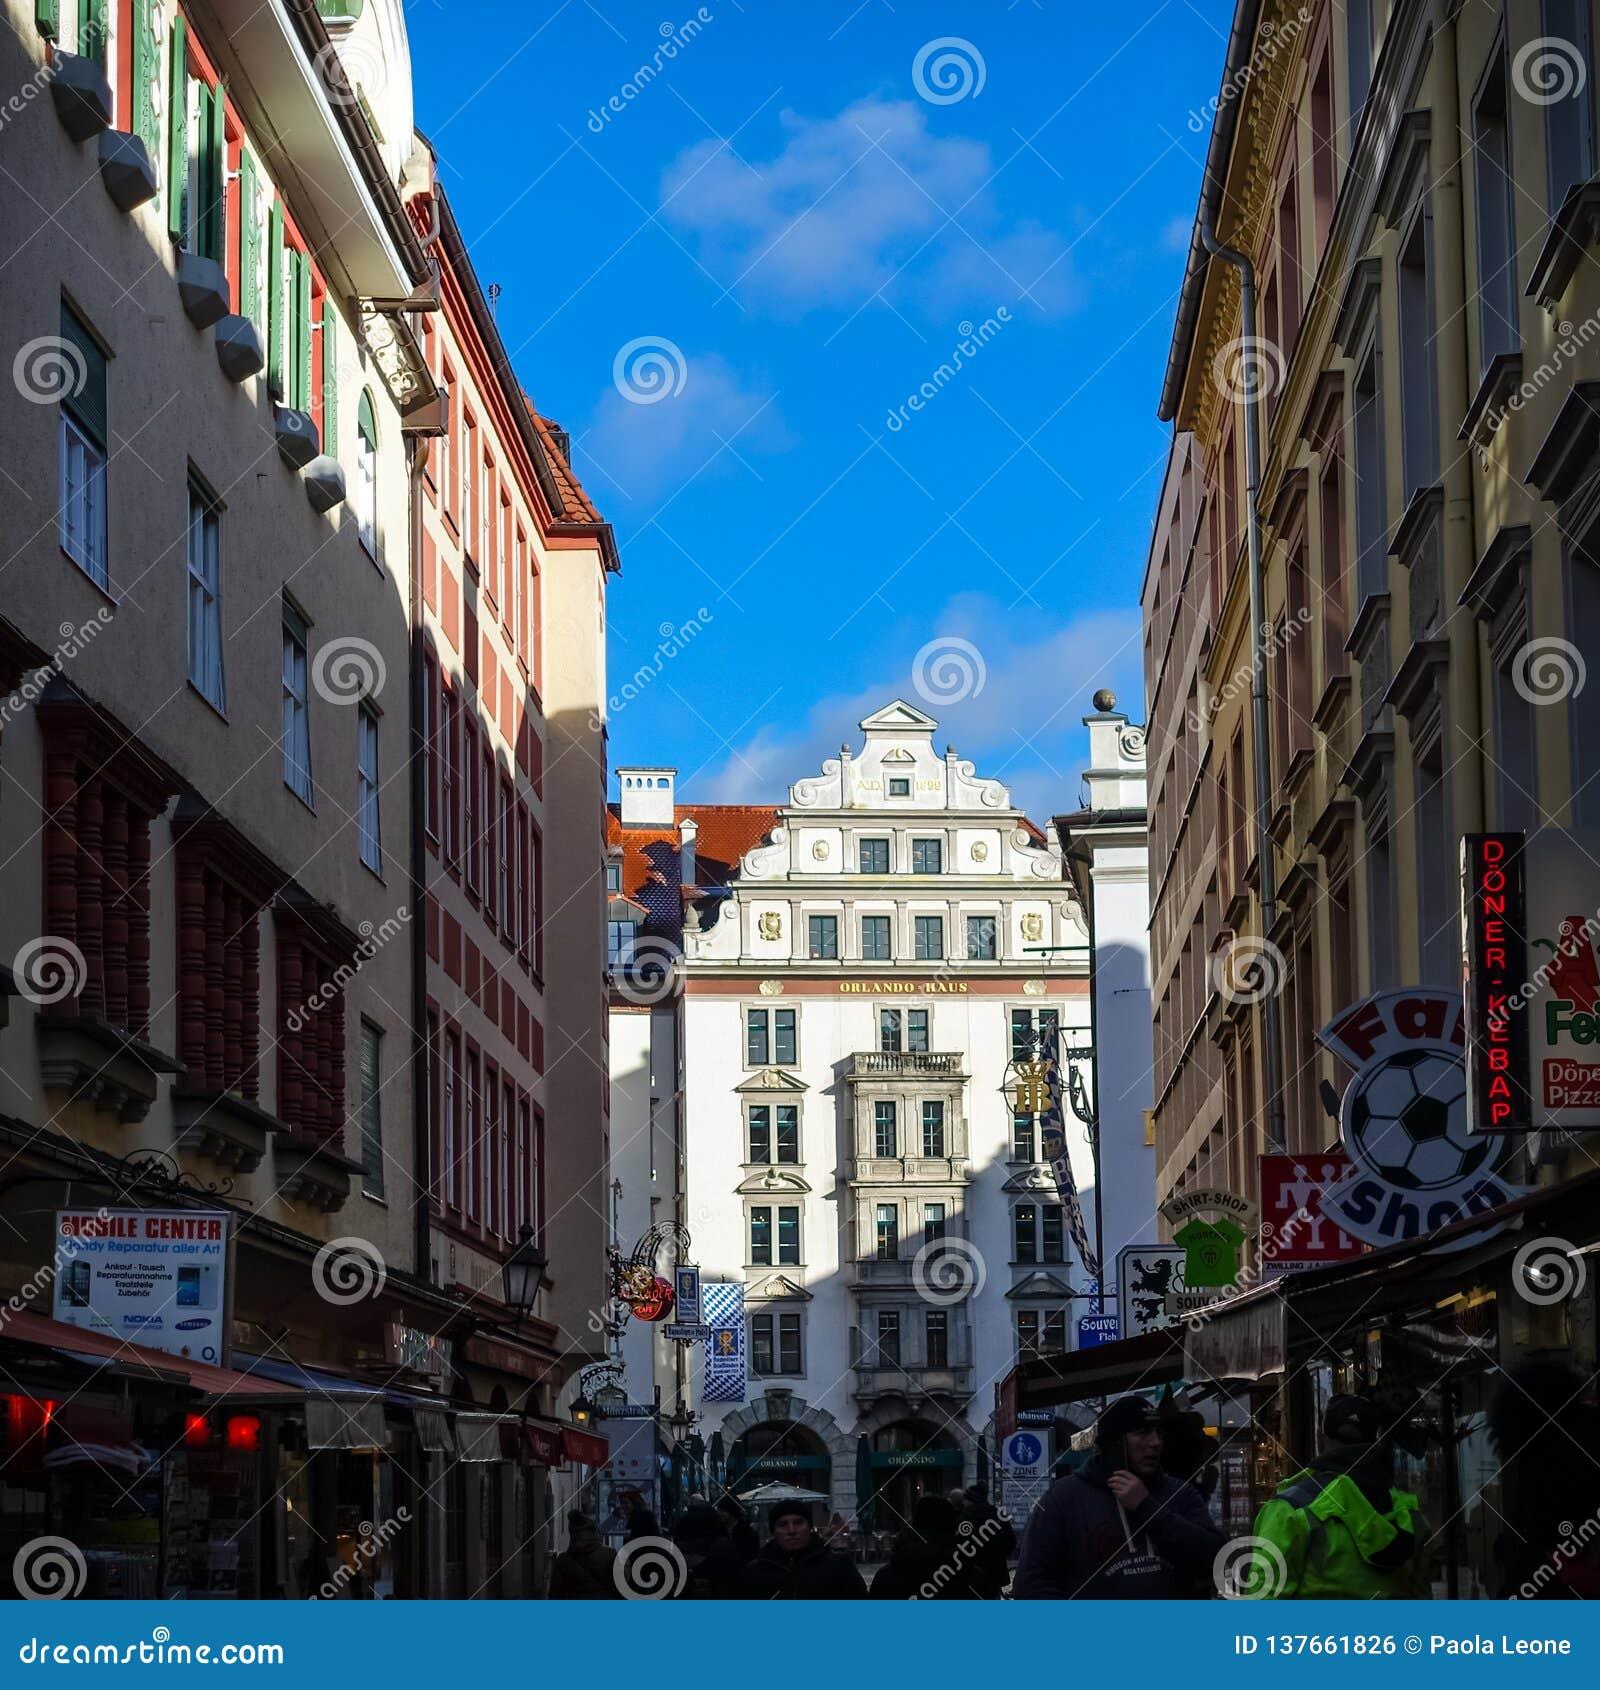 Munich, GERMANY - January 17, 2018: Platzl with Orlando Haus in Munich